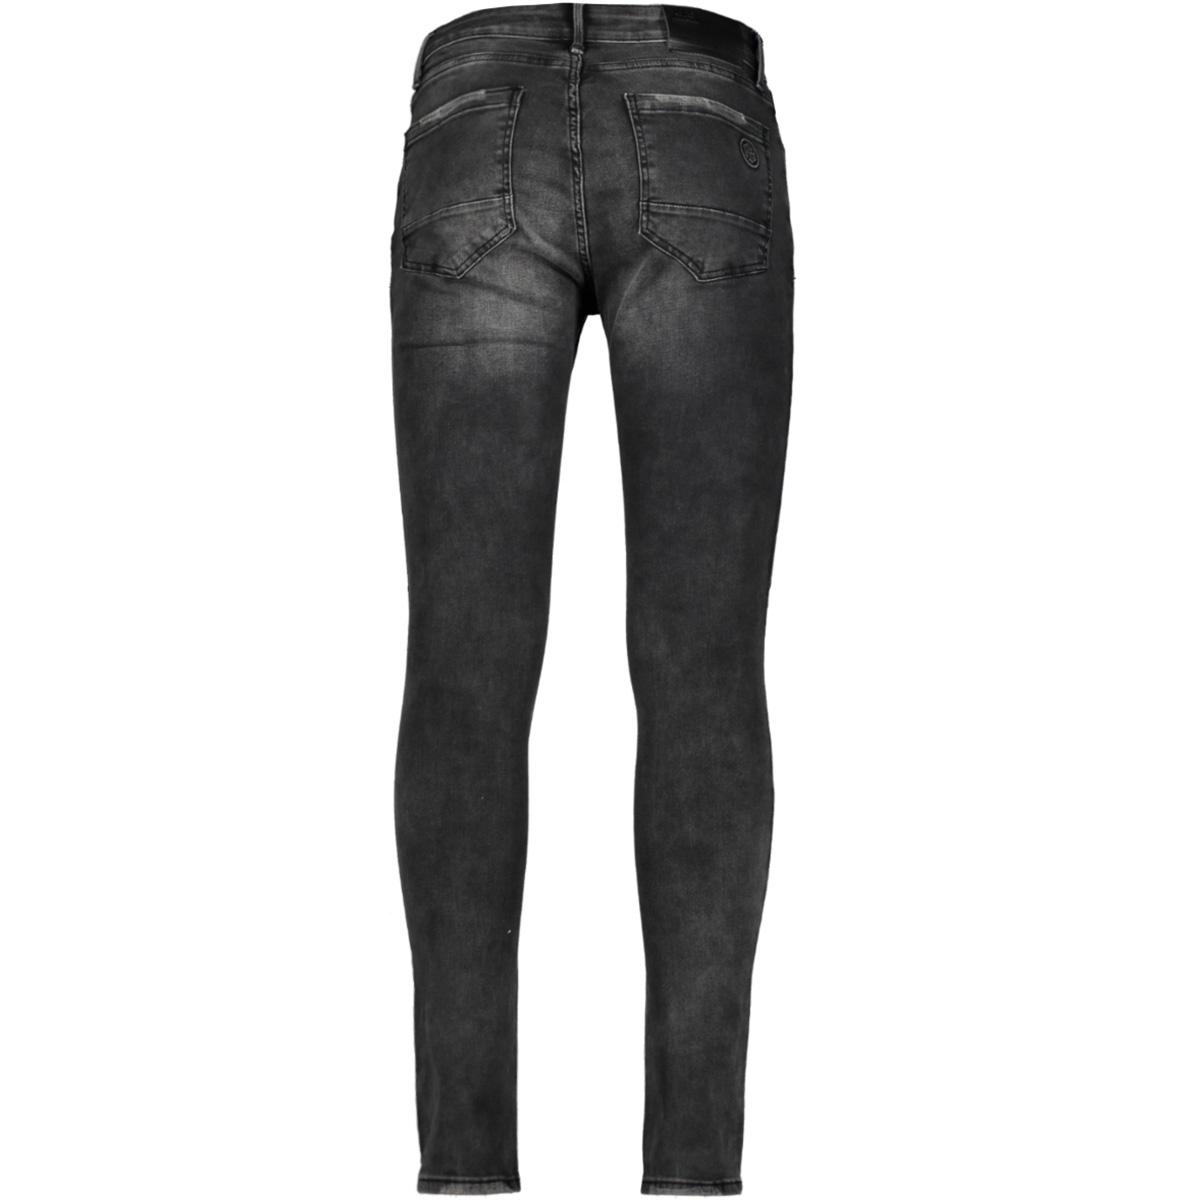 jeans 82552 gabbiano jeans grey